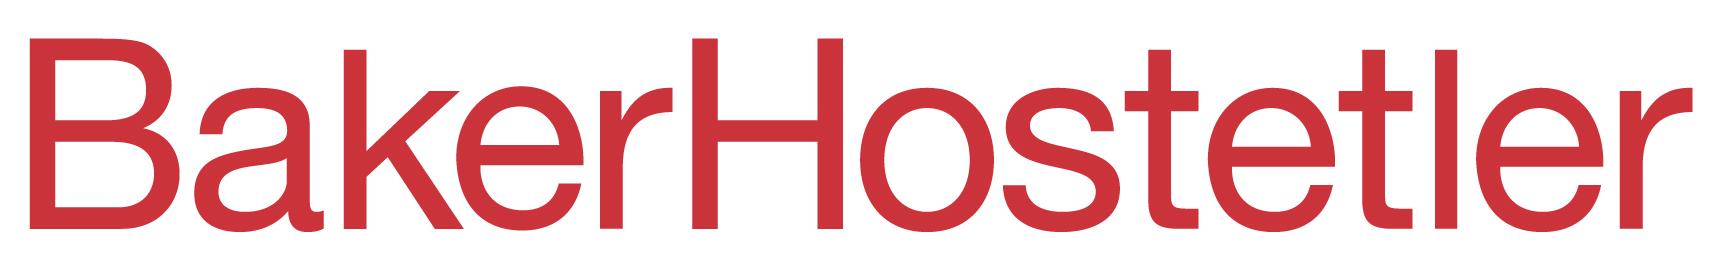 BakerHostetler2012-NEW-logo (1).jpg